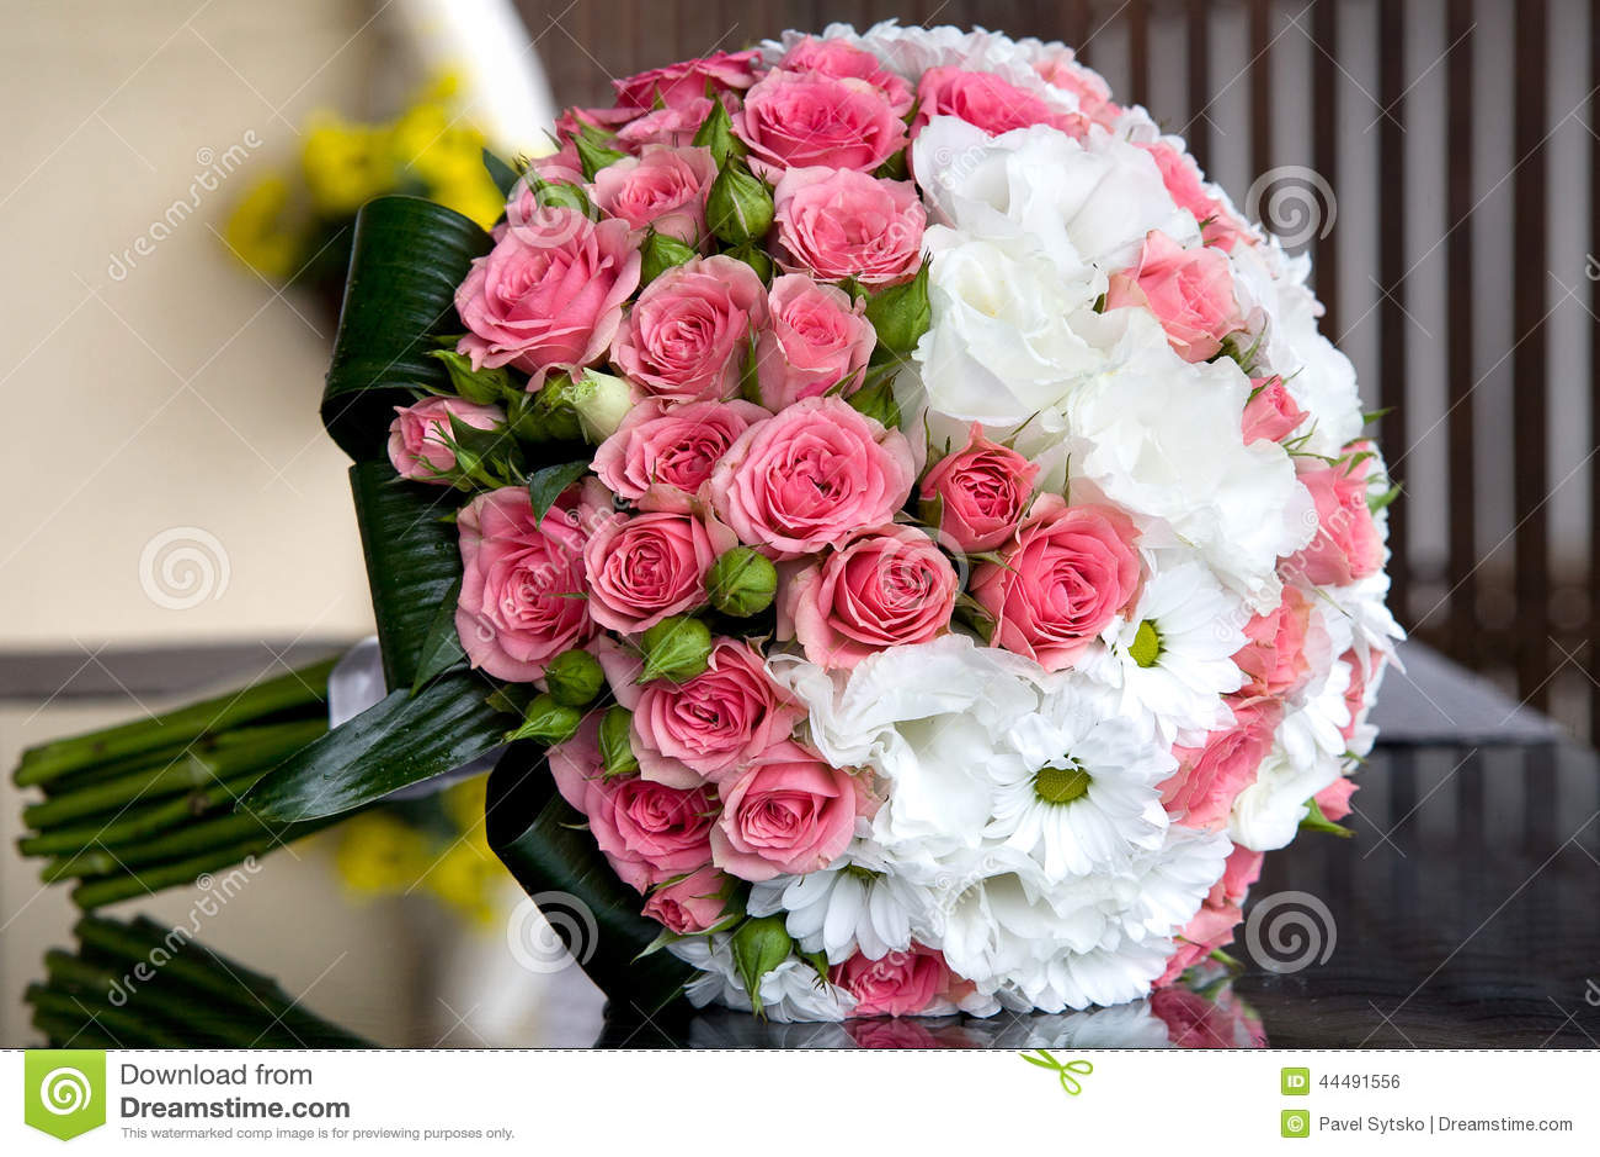 Fleurs pour mariage for Fleurs fraiches